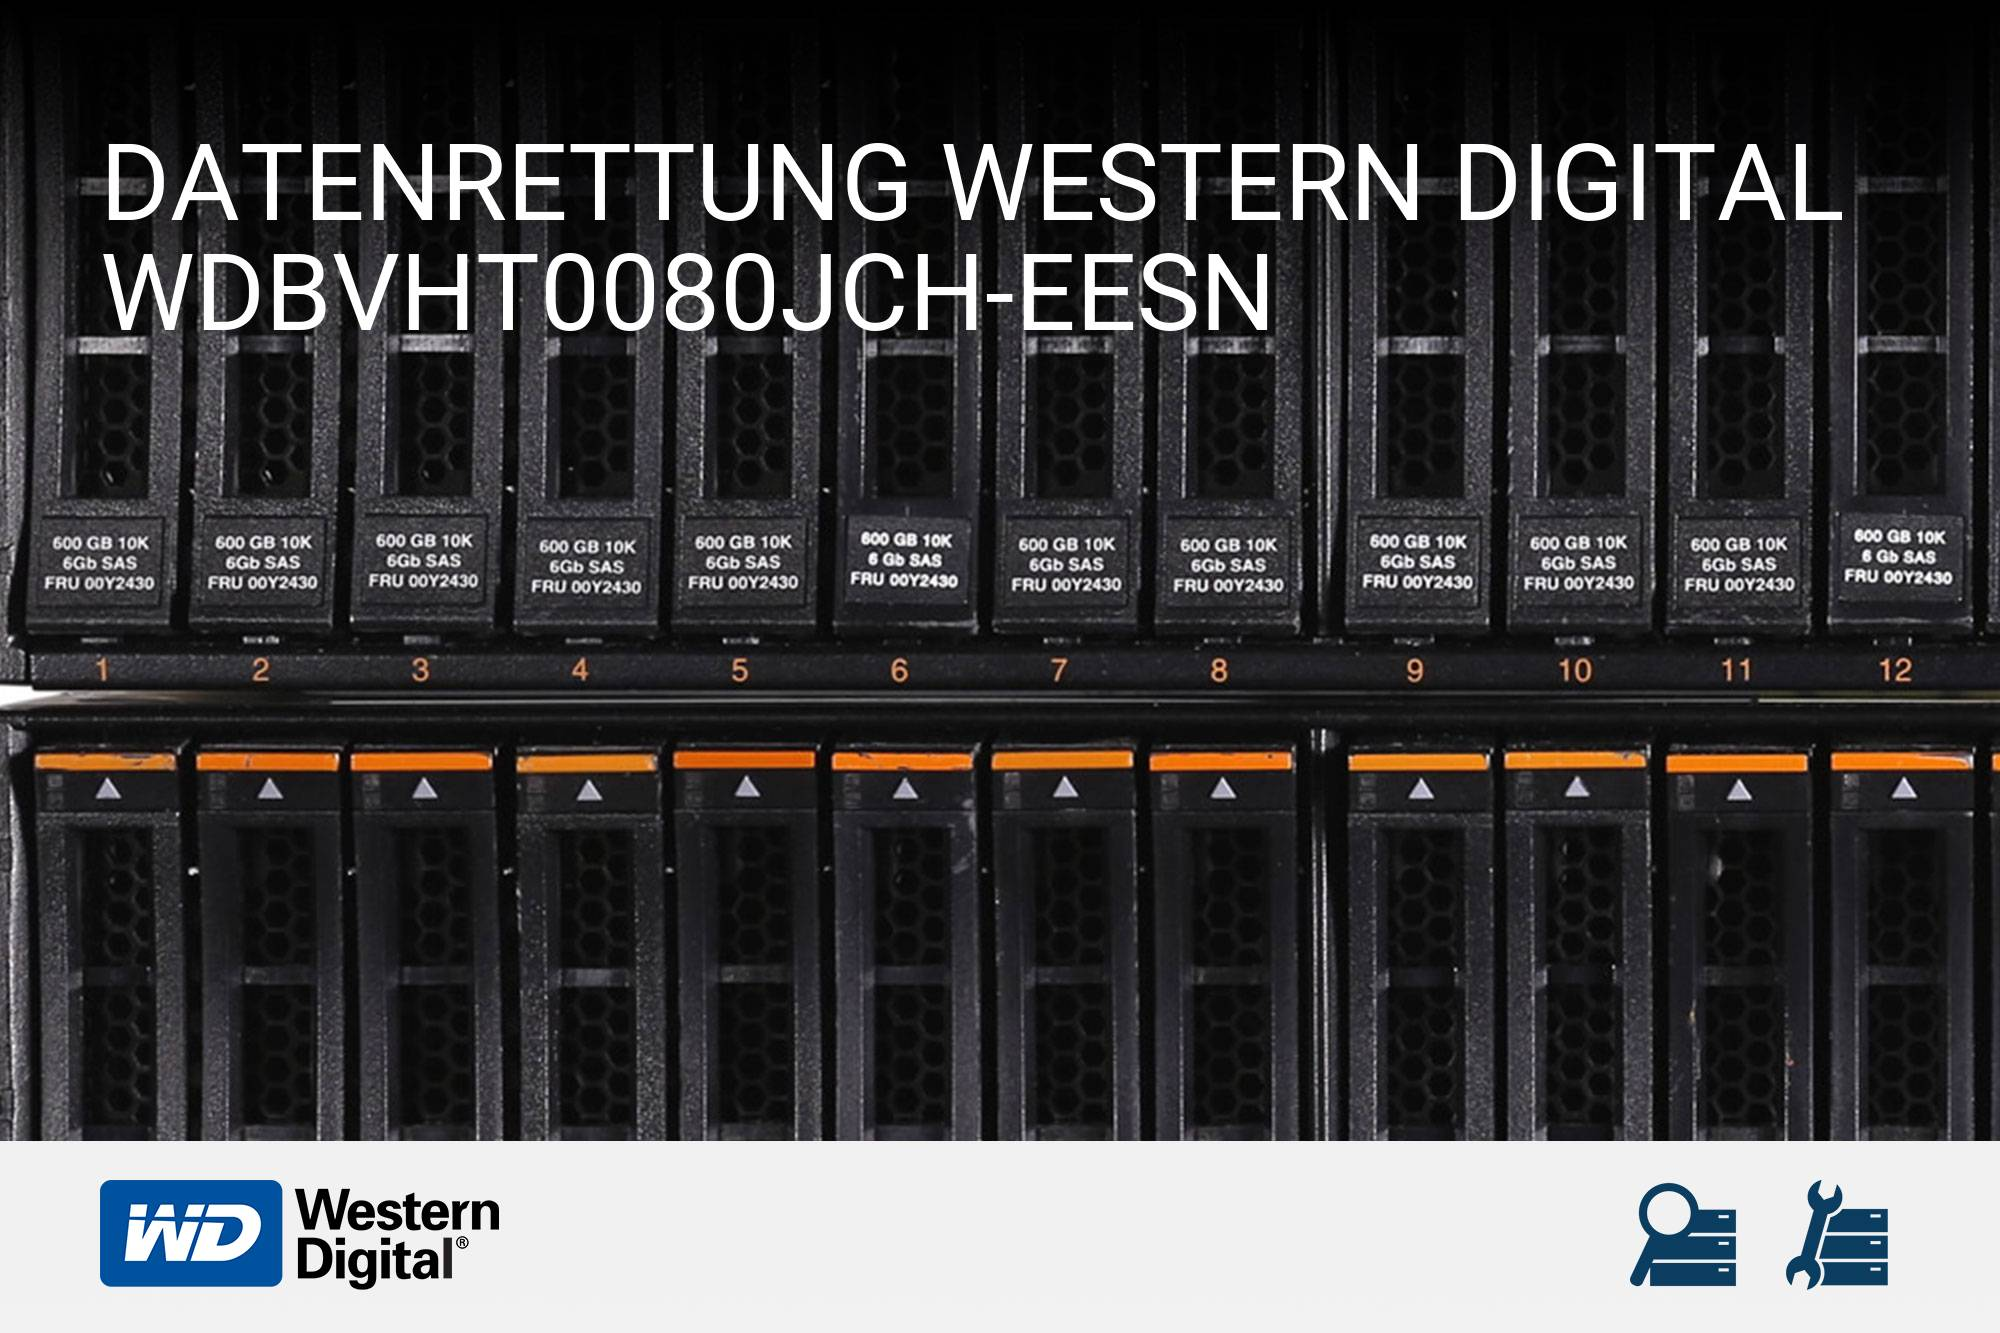 Western Digital WDBVHT0080JCH-EESN